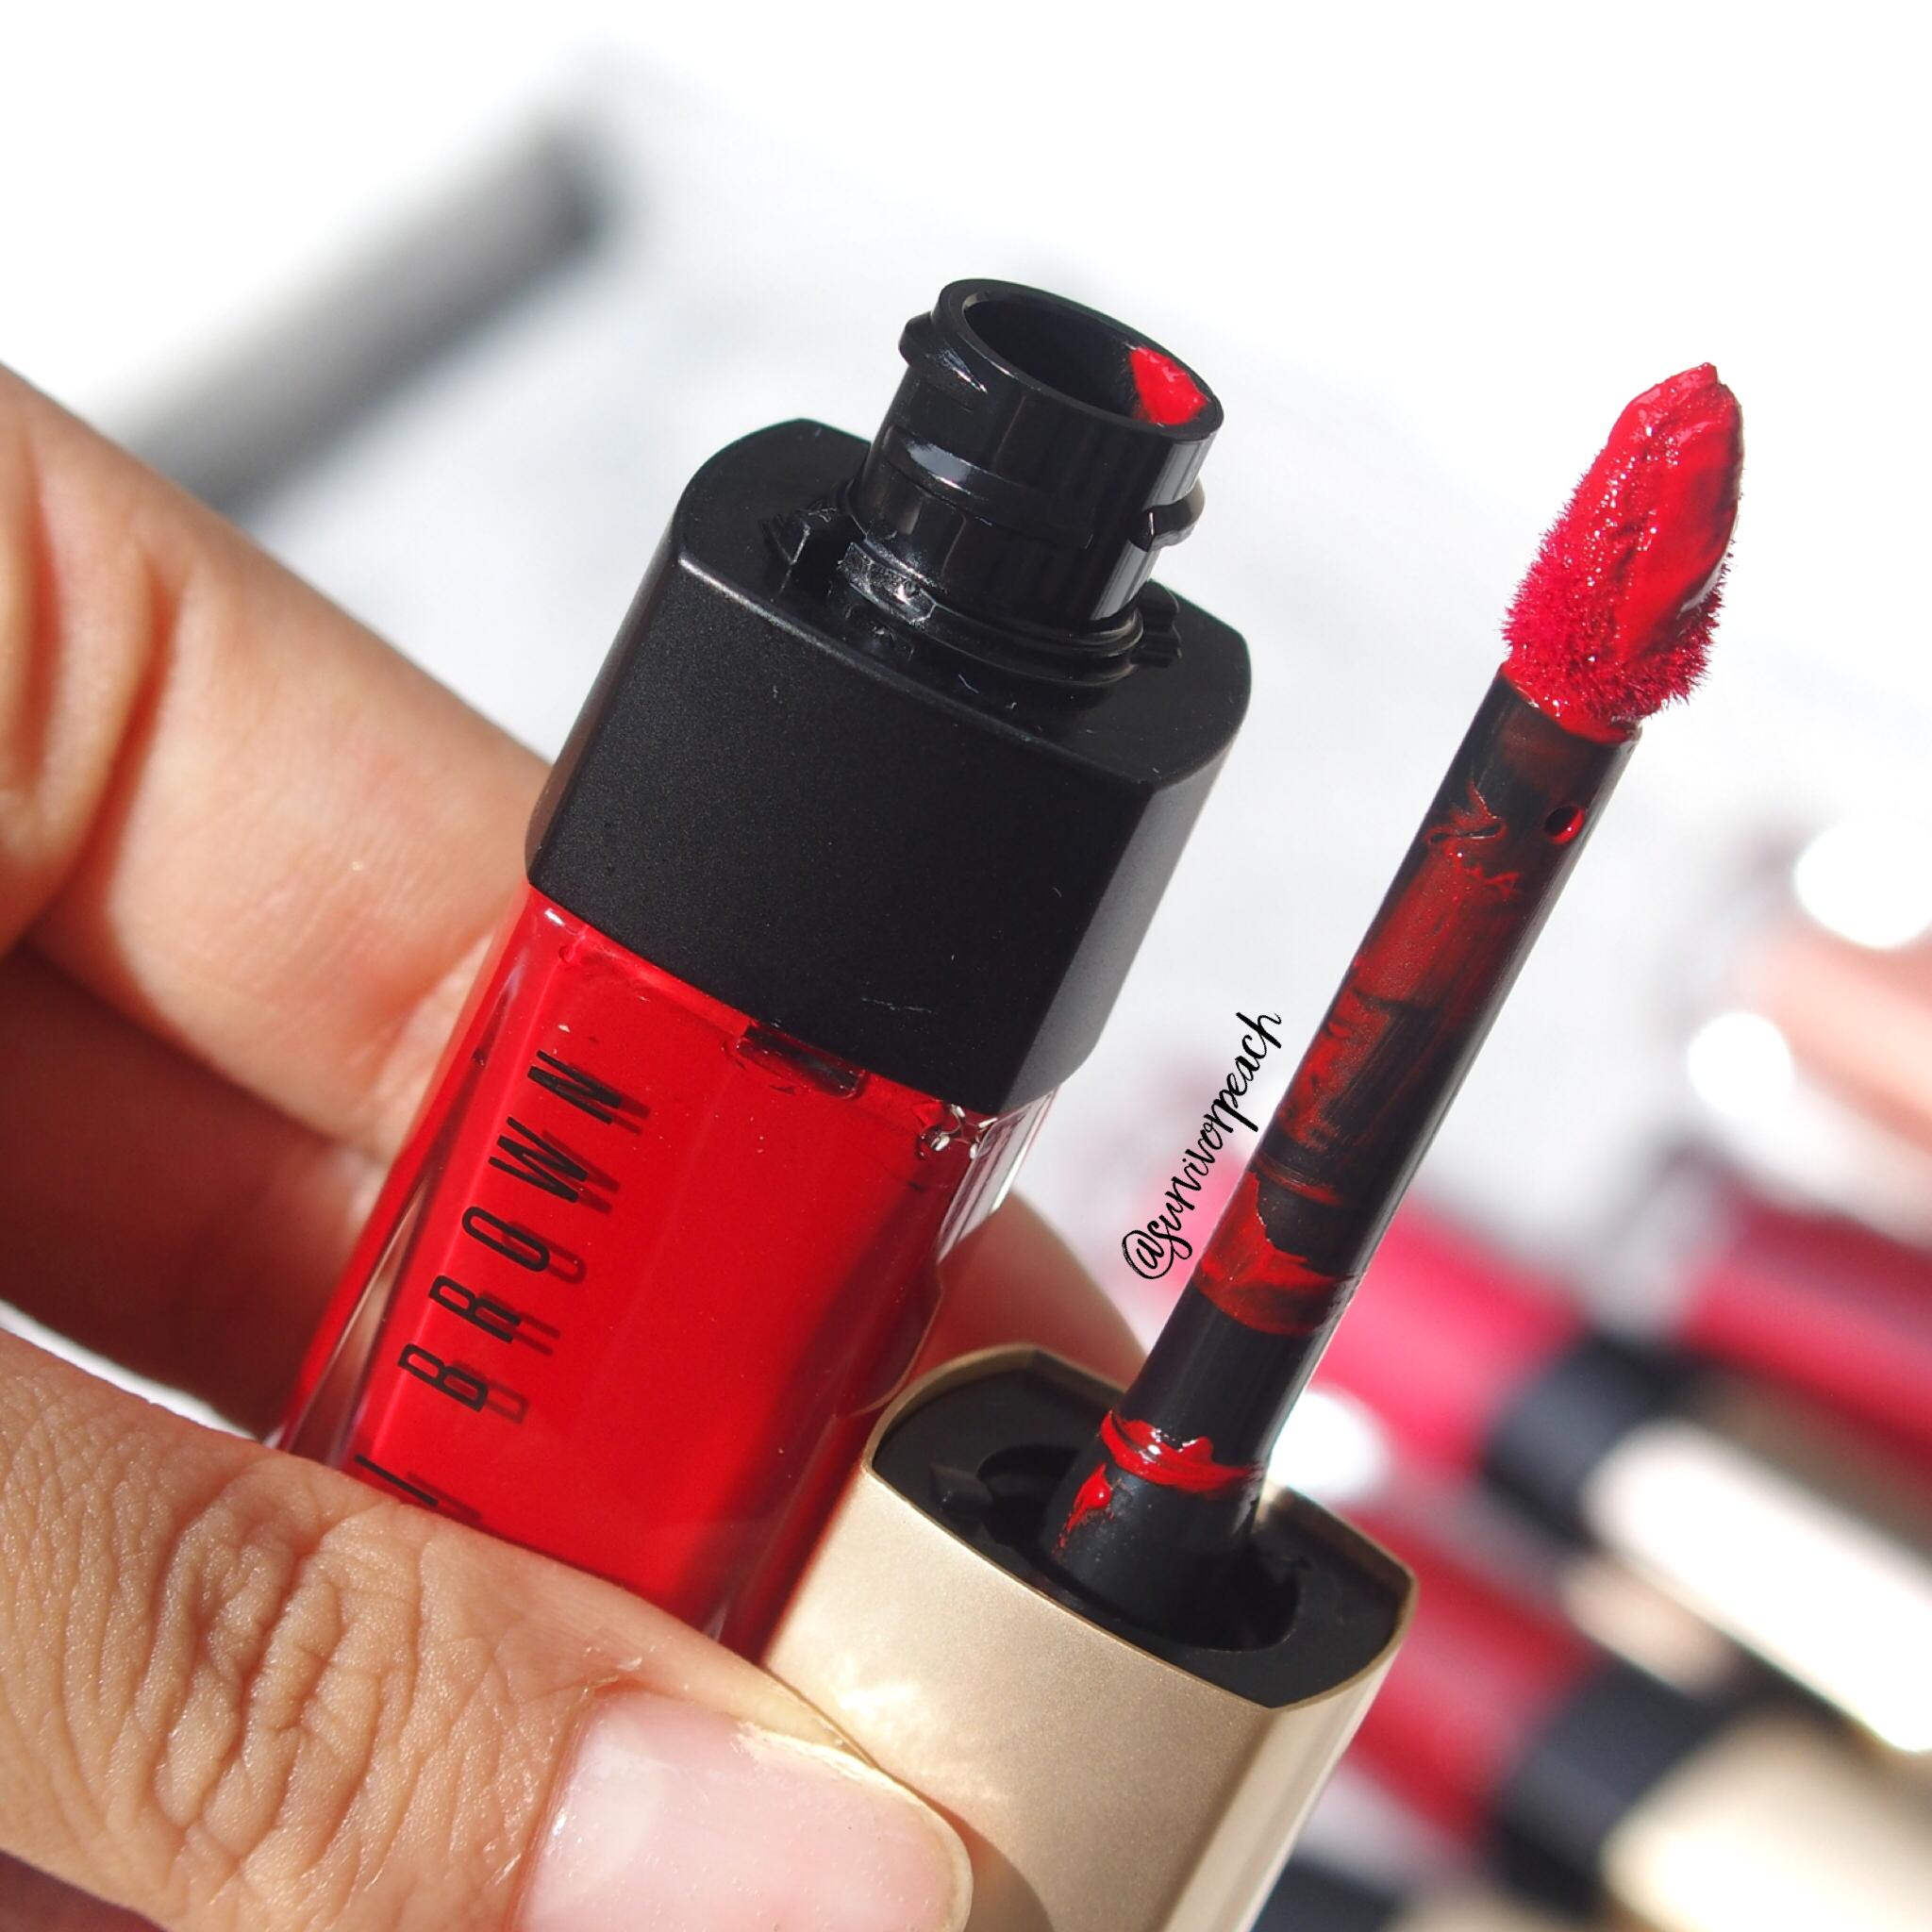 Bobbi Brown Luxe Liquid Lip Velvet Matte Lipstick Blood Orange